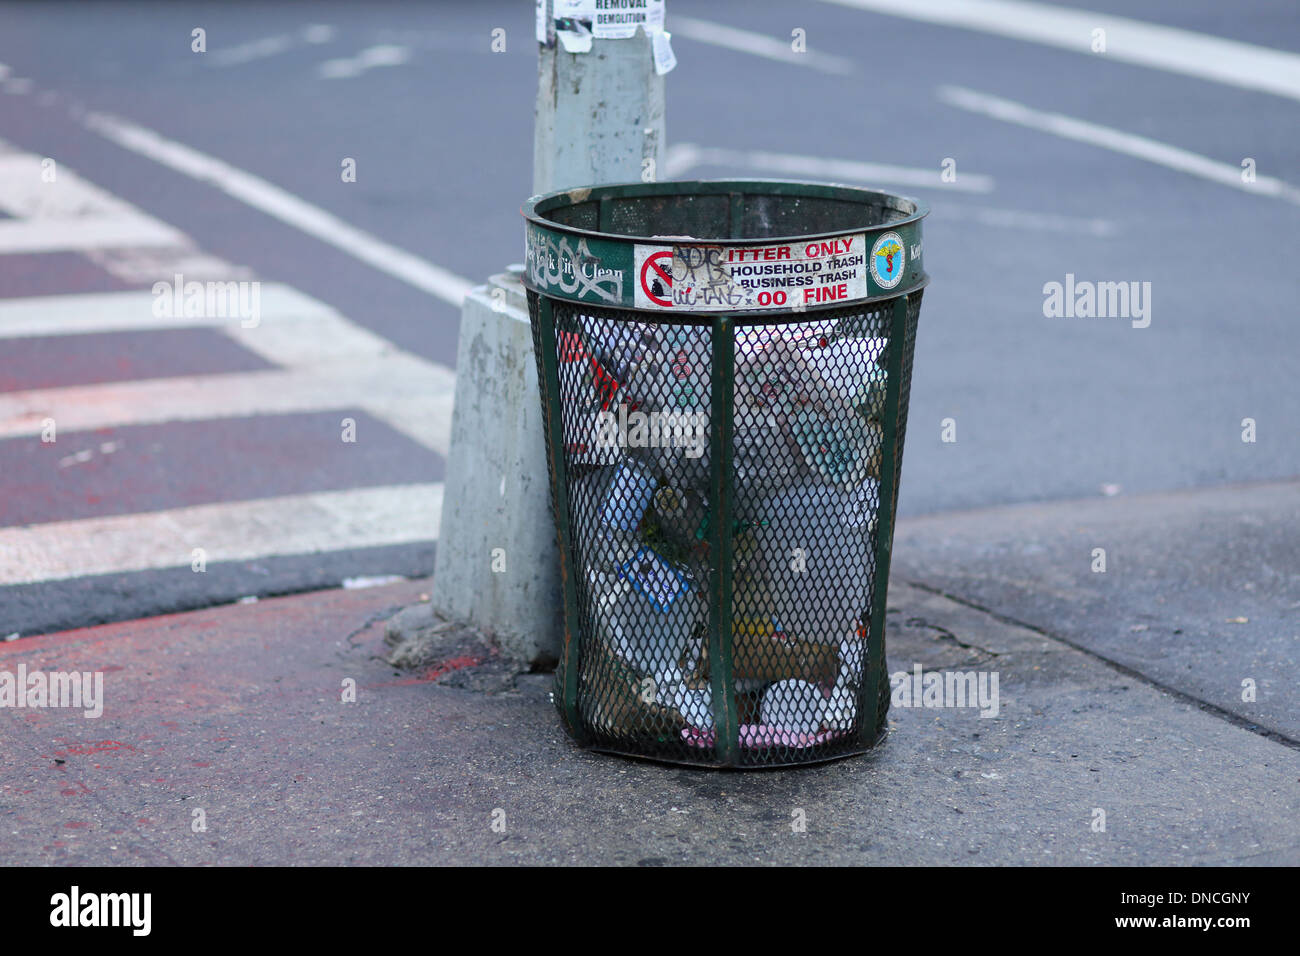 NYC Trash can - Stock Image